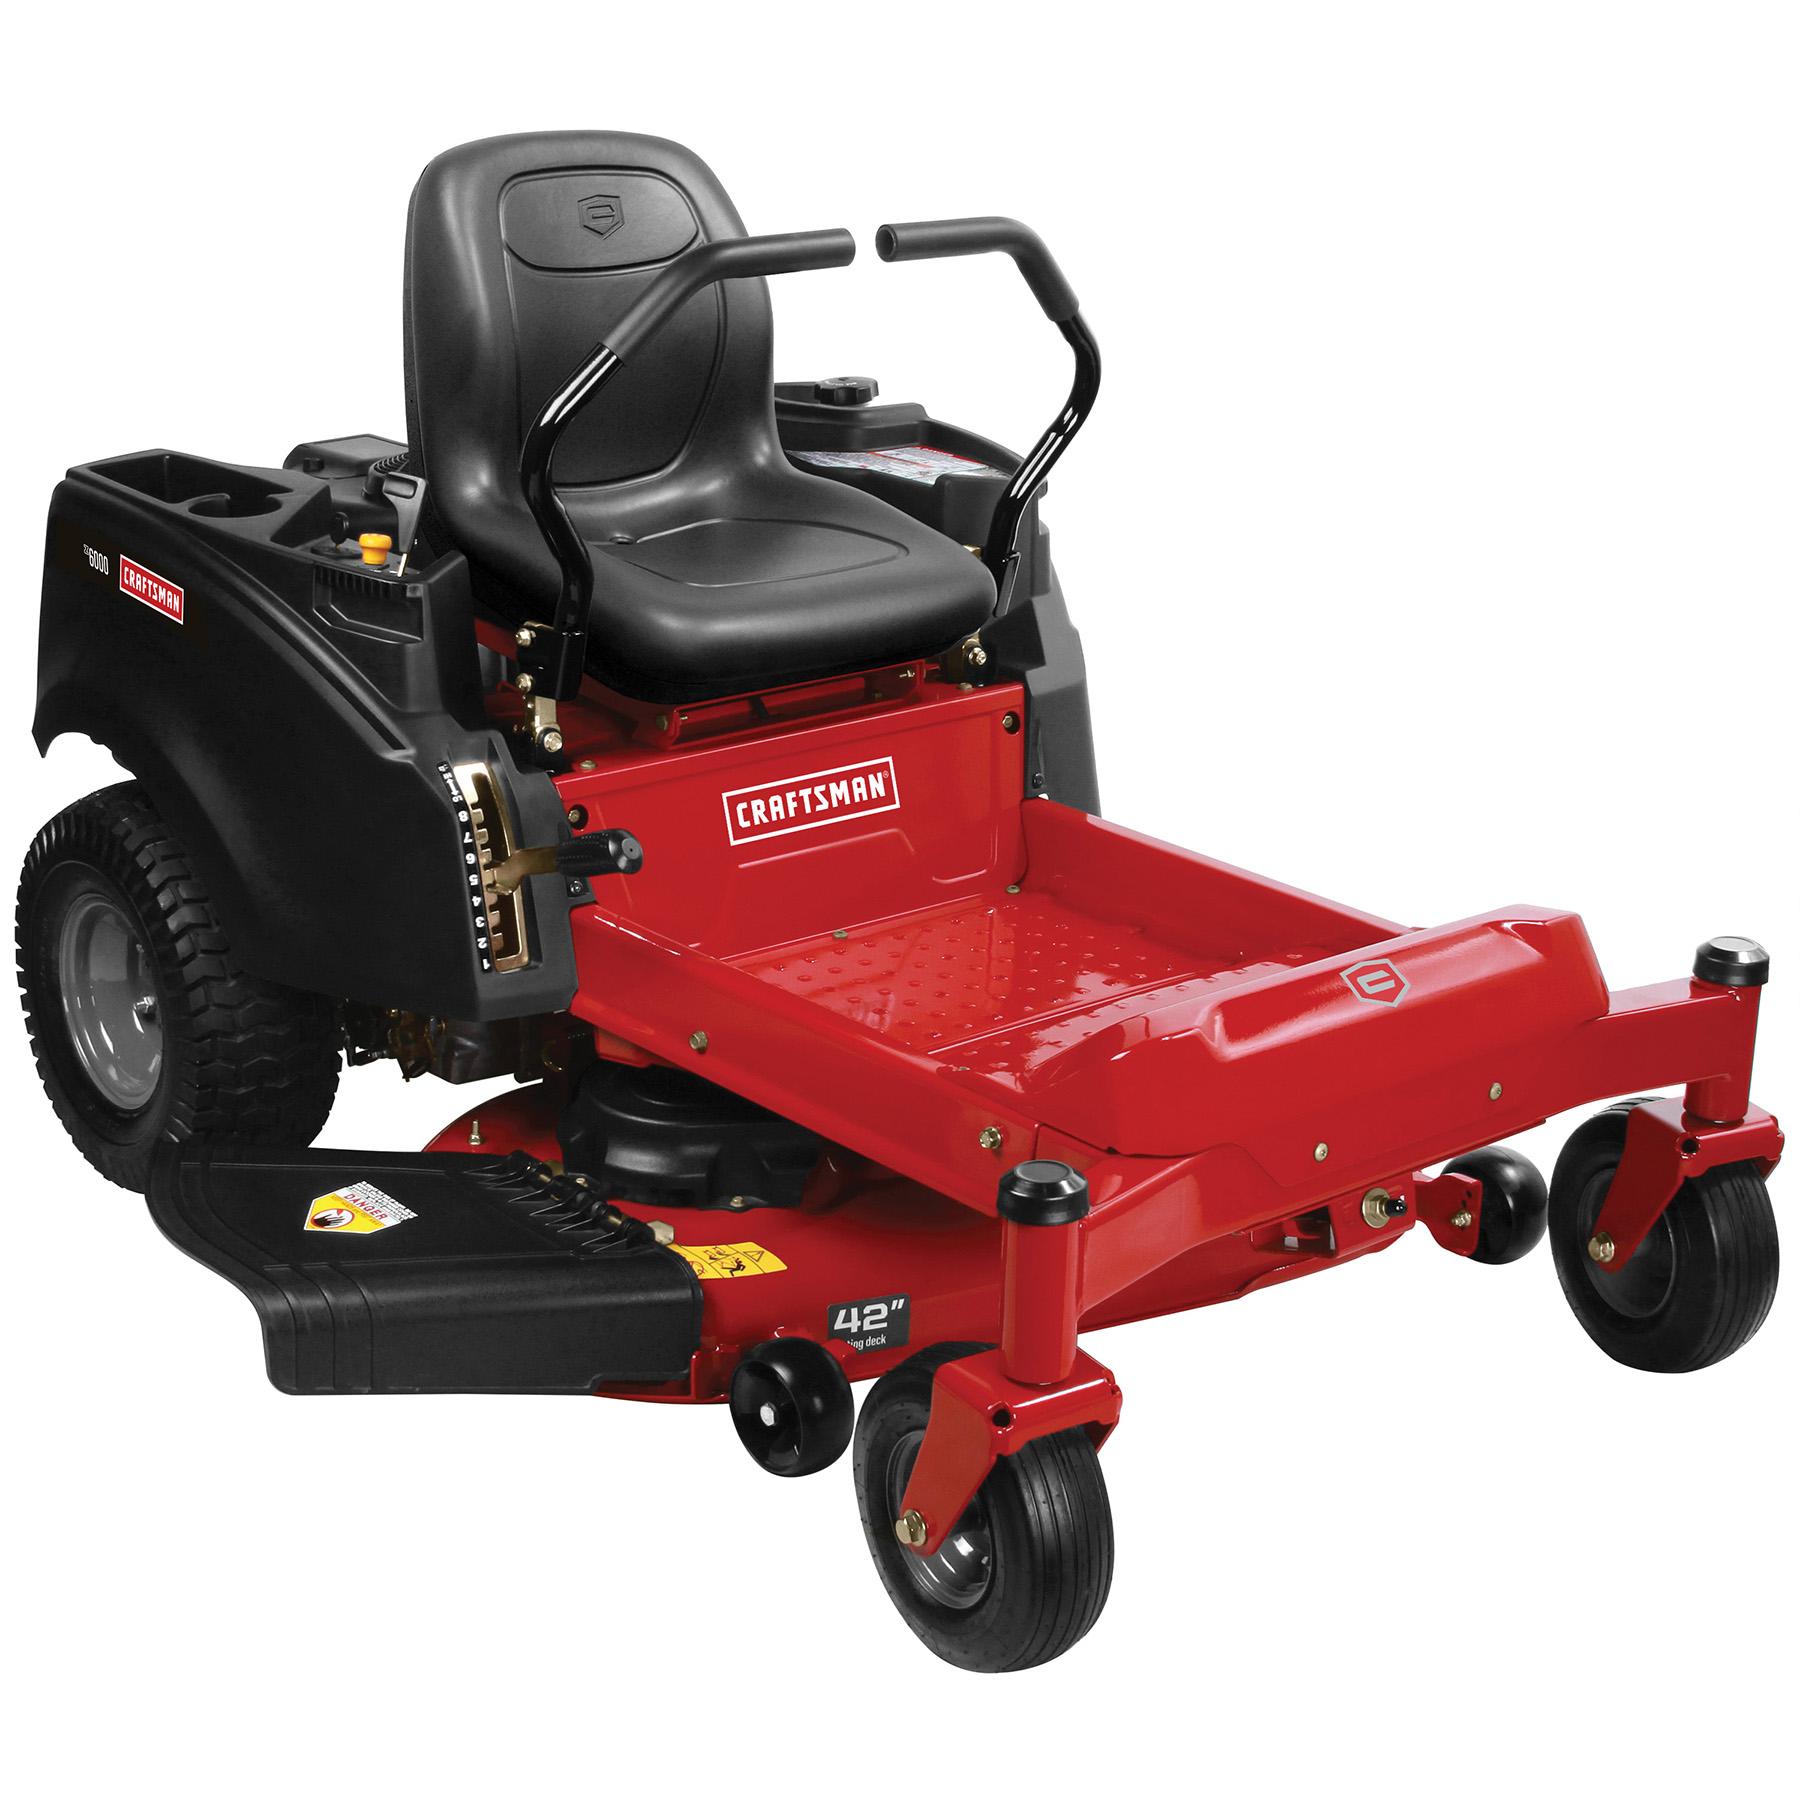 craftsman 20411 42 22 hp v twin briggs stratton zero turn riding mower [ 1800 x 1800 Pixel ]